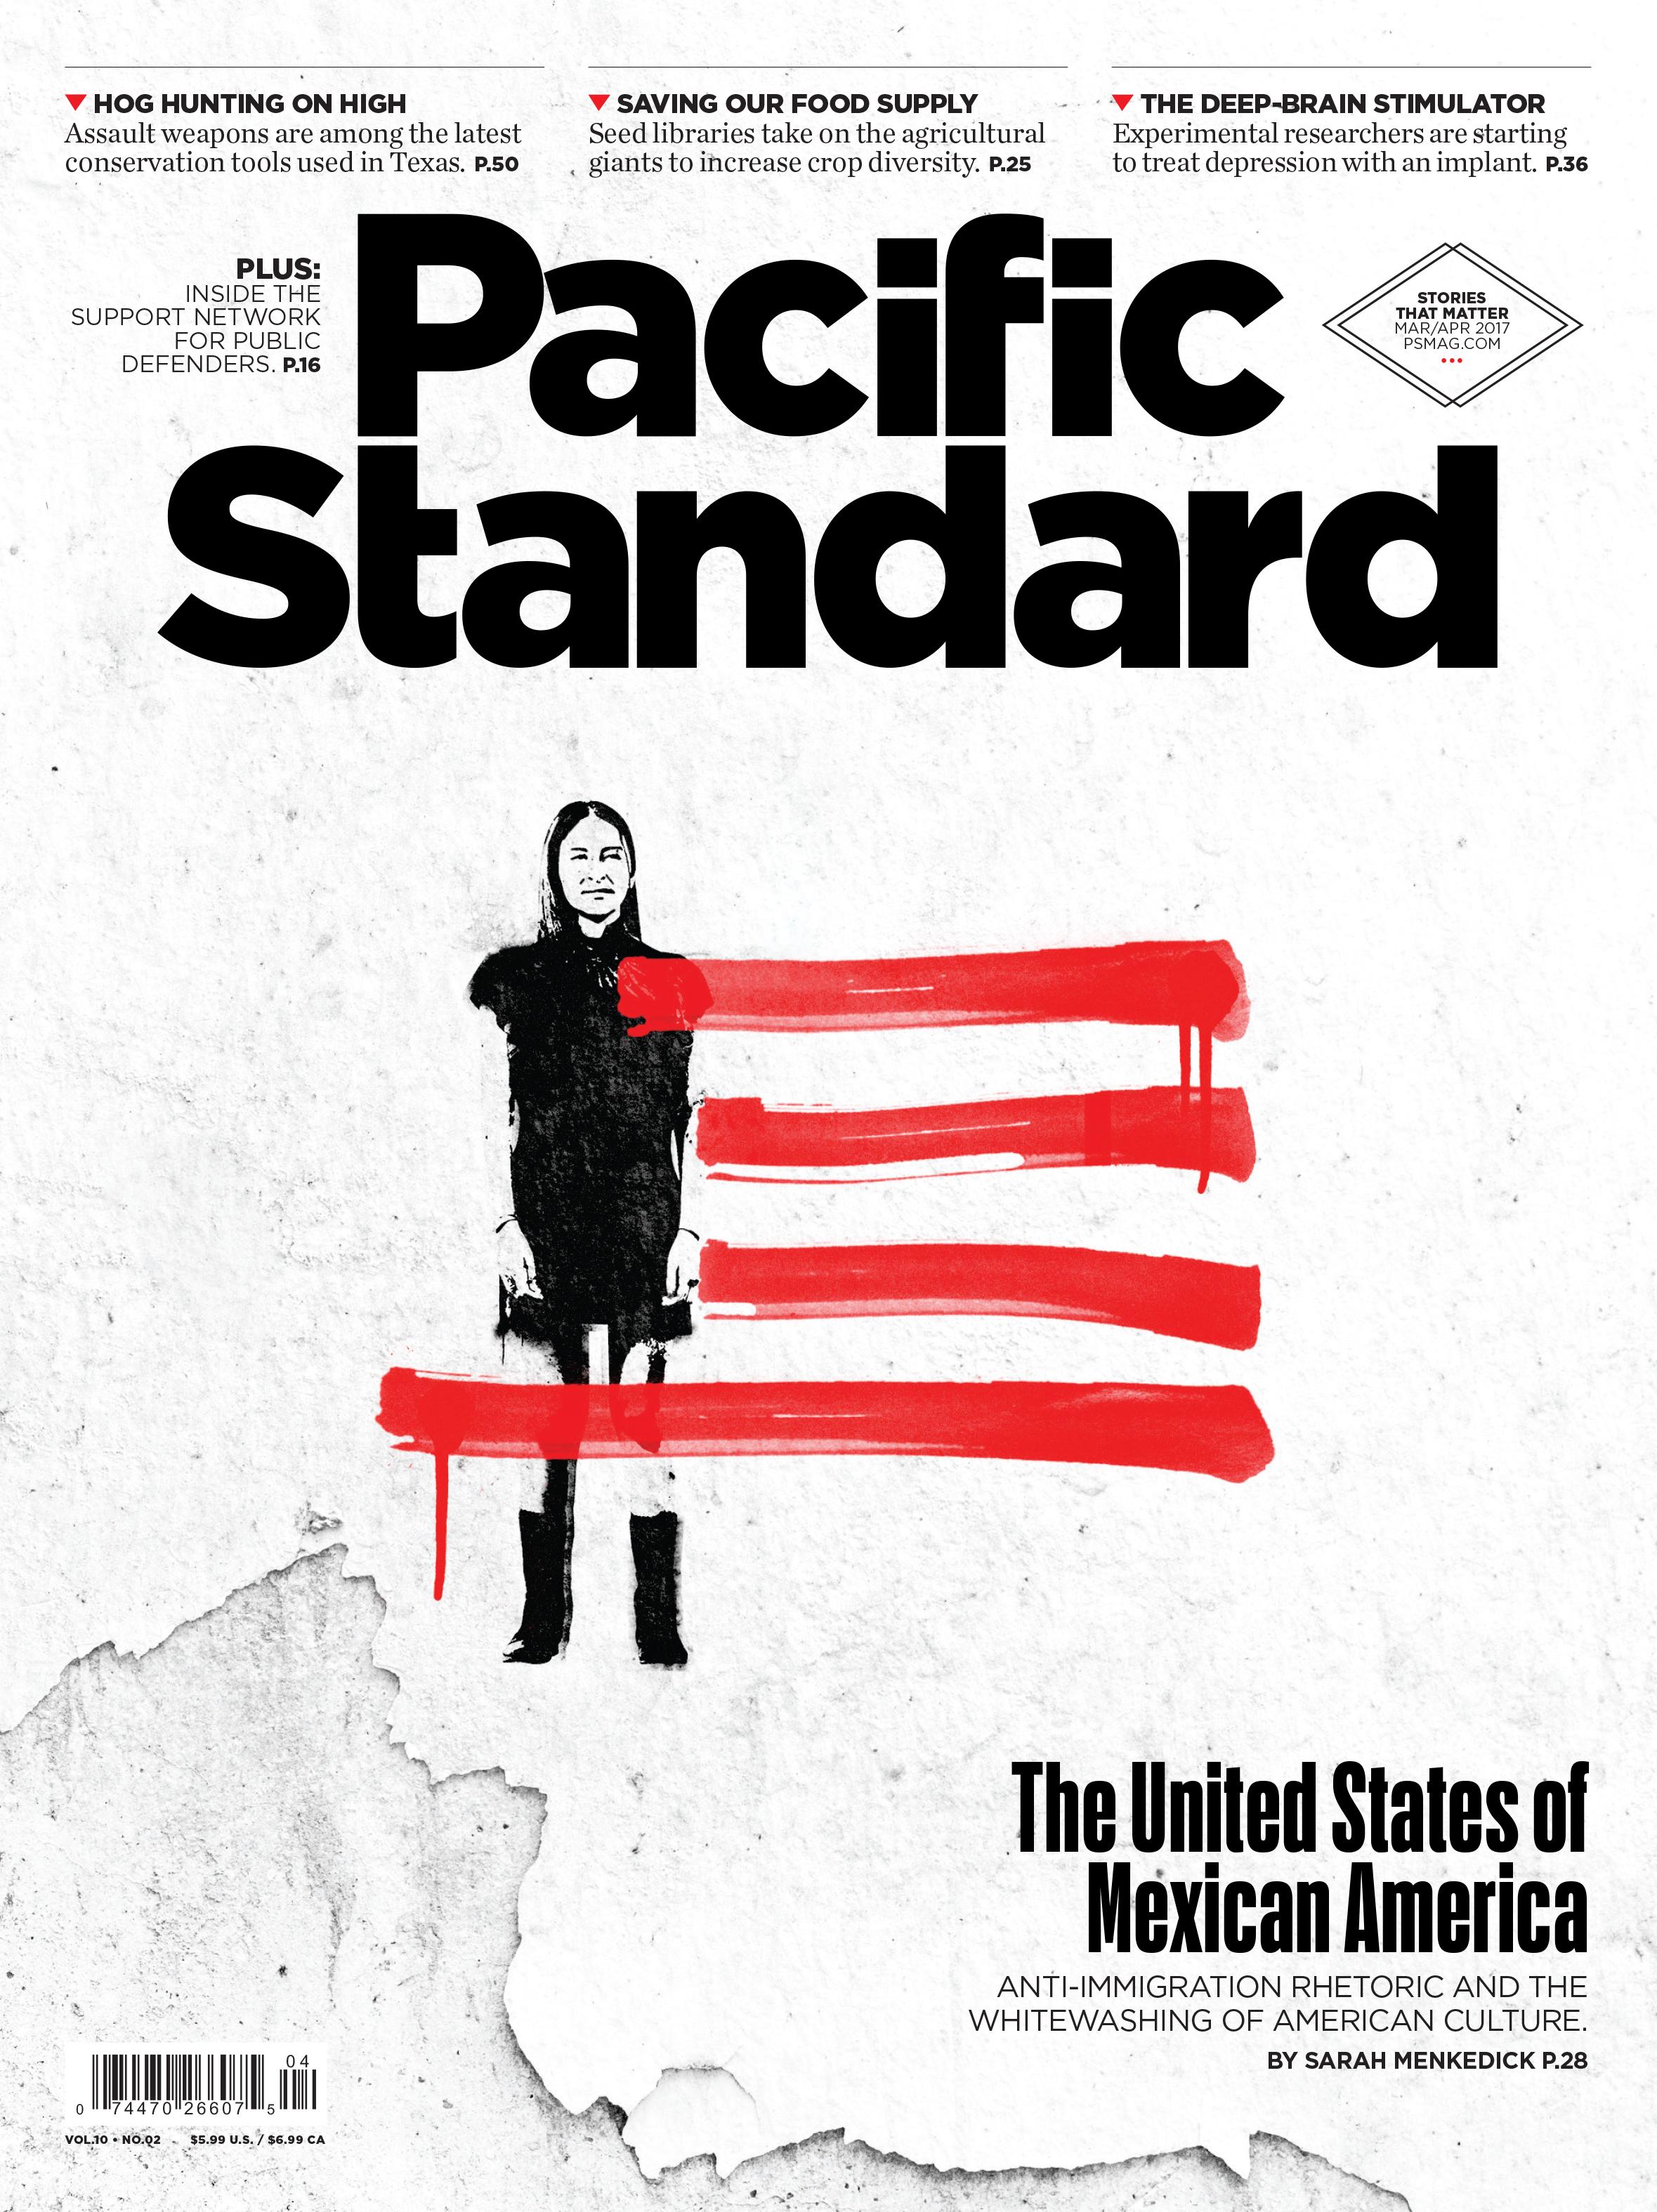 Pacific Standard cover, March/April 2017 (courtesy Nicholas Jackson)